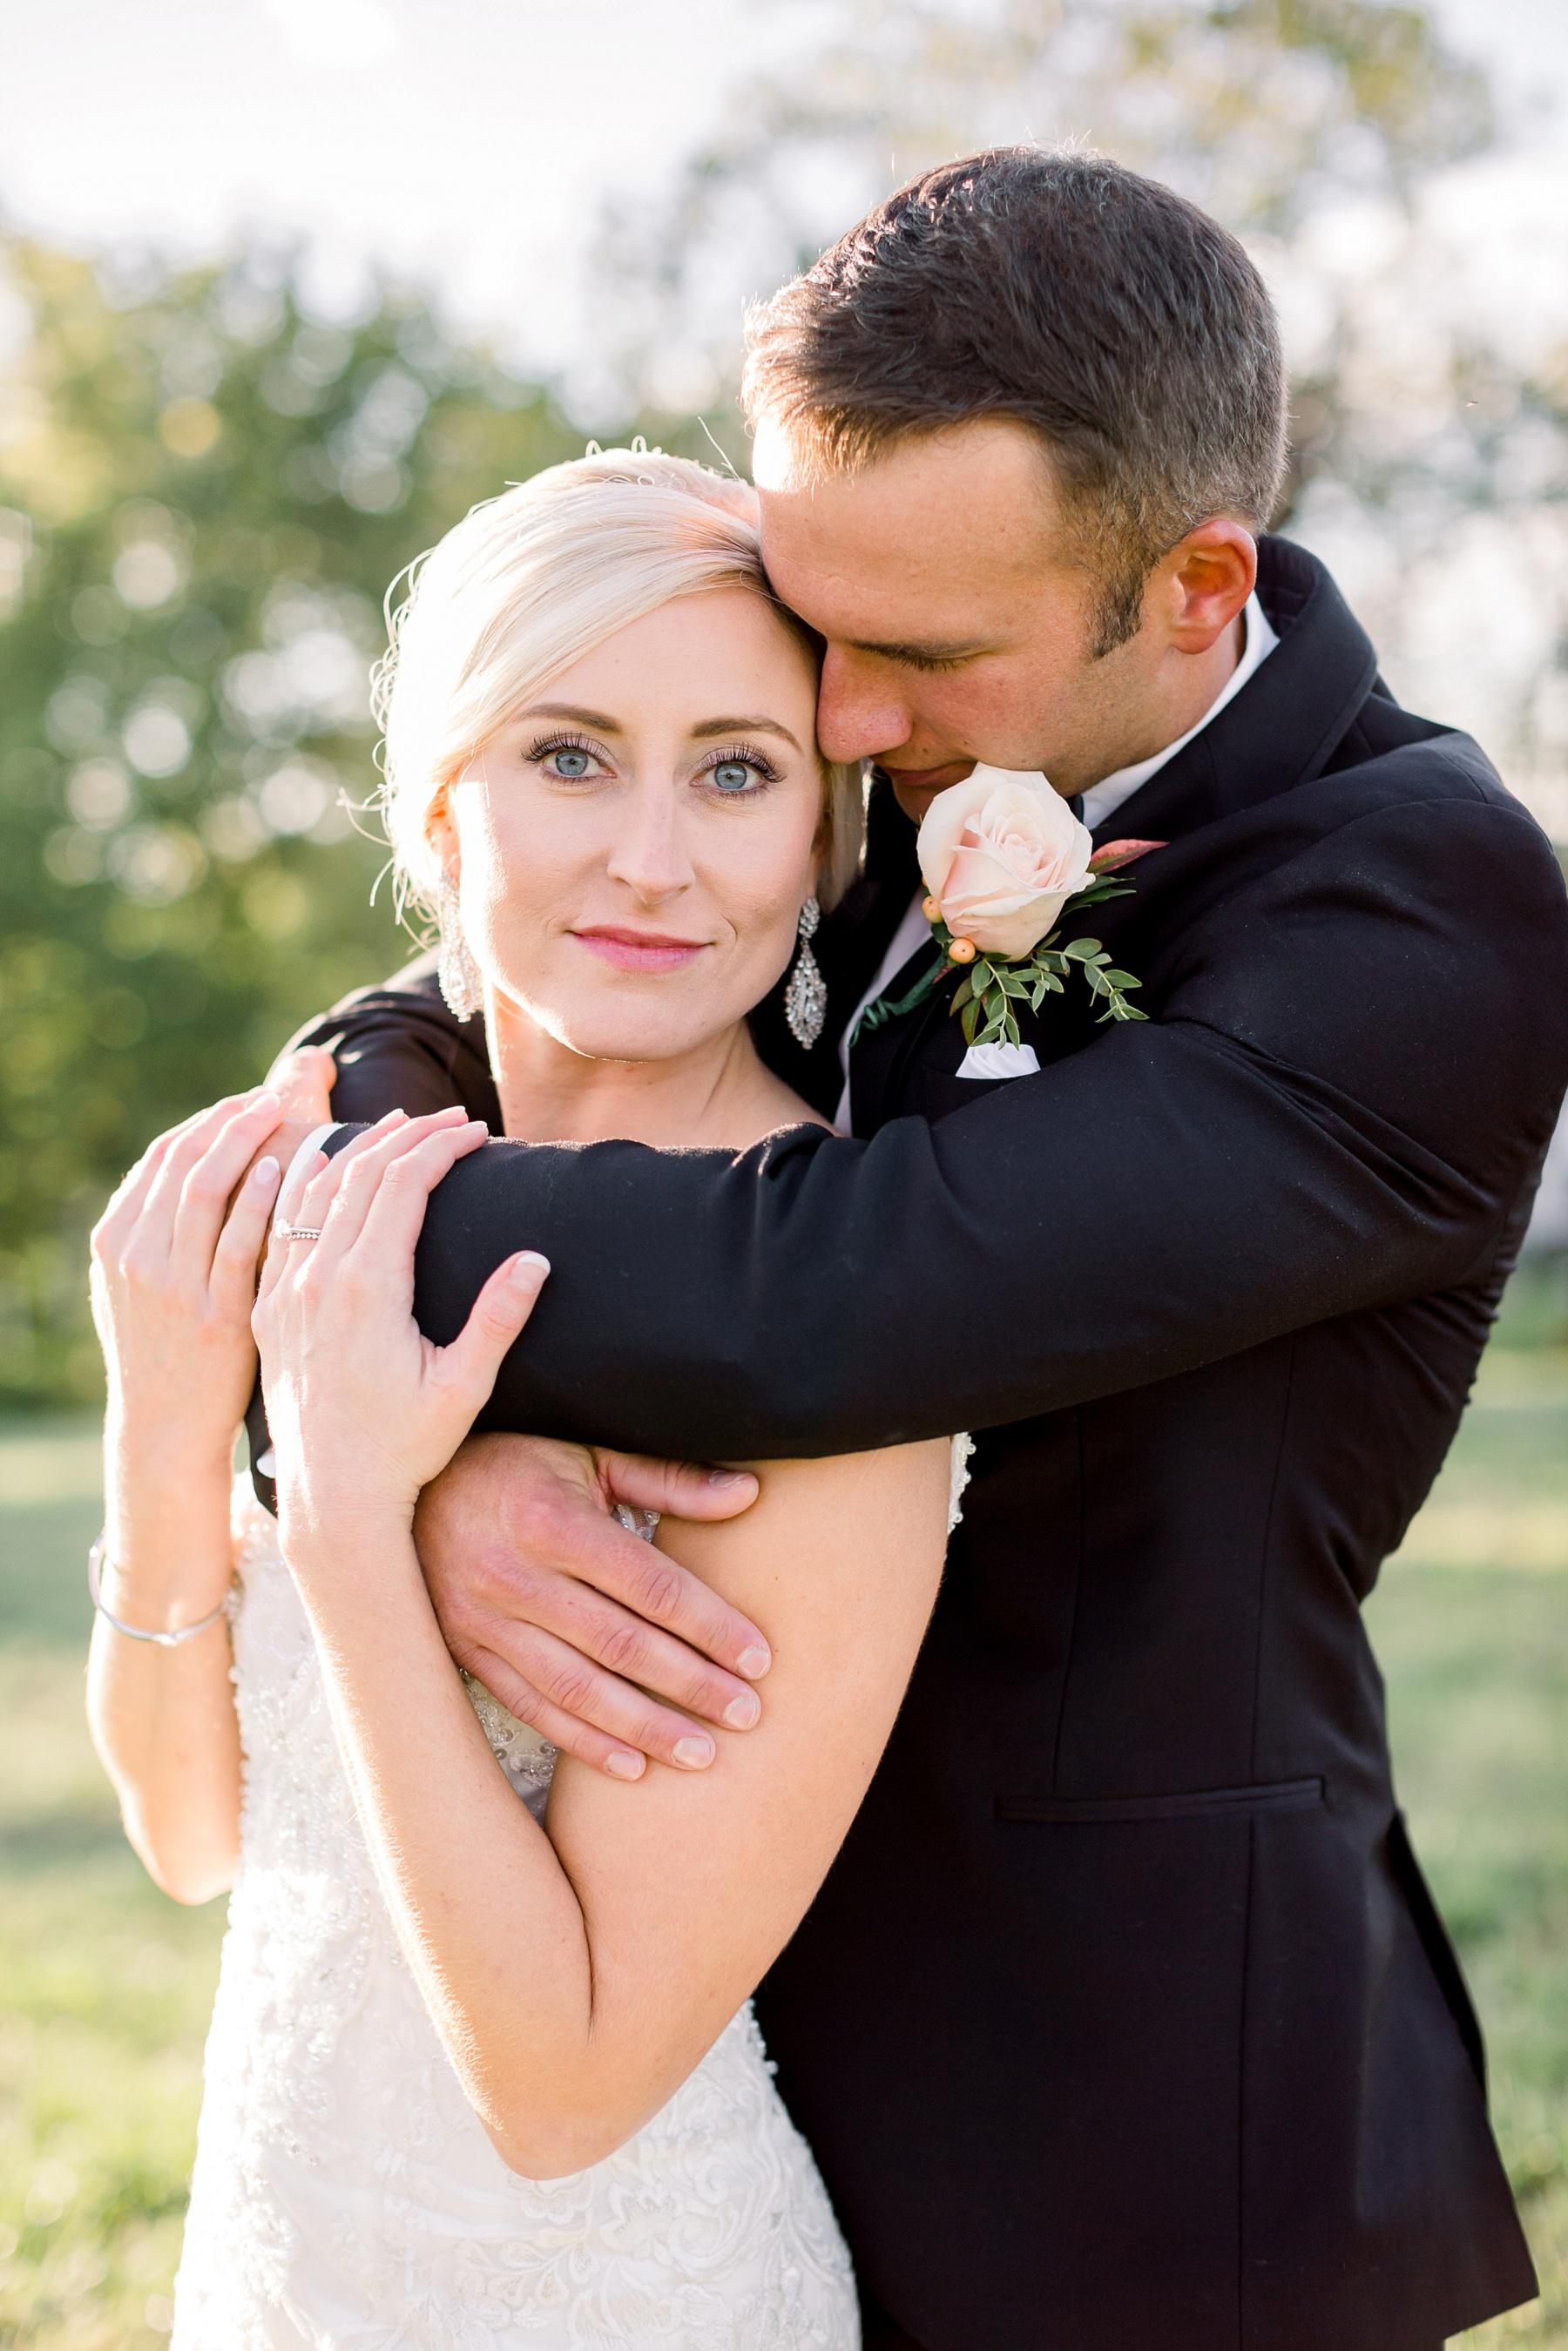 midwest-adventurous-wedding-photographer-elizabeth-ladean-photography-photo_4800.jpg